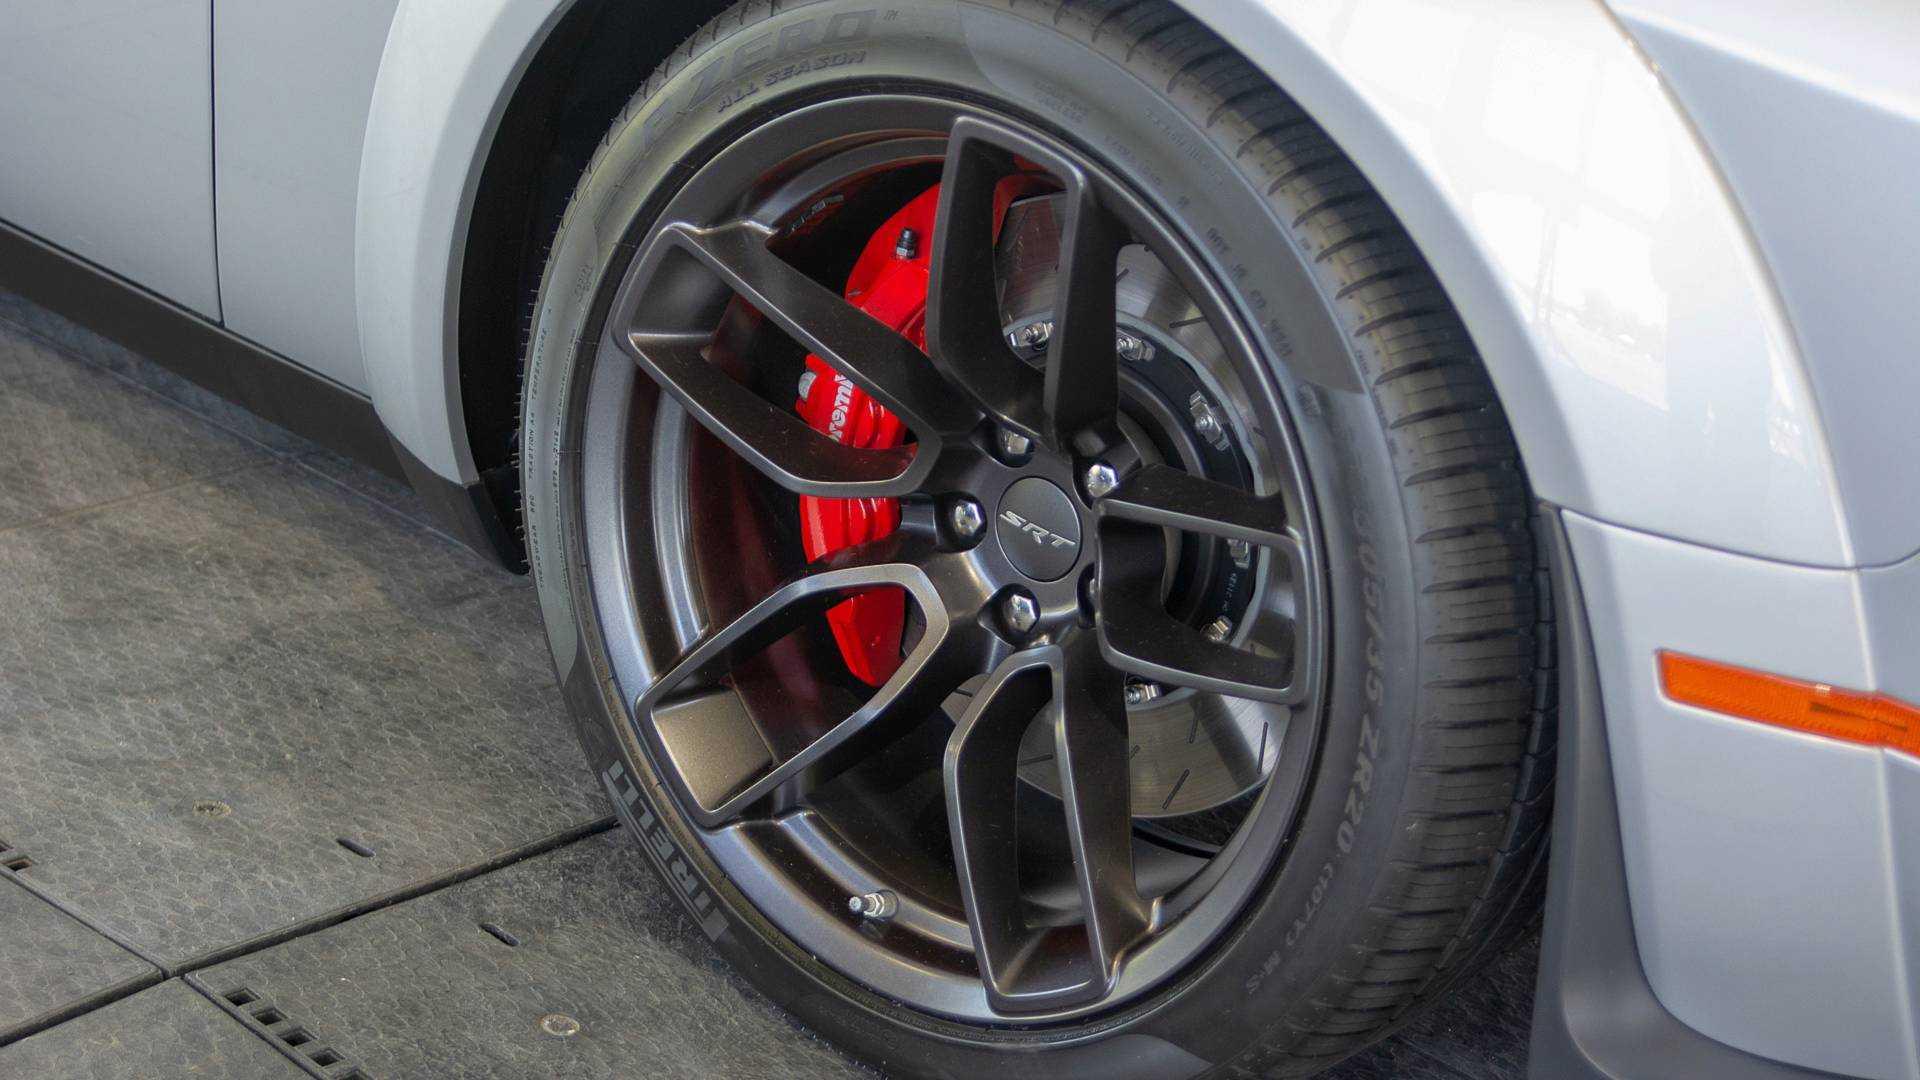 2019 Dodge Challenger Priced Srt Hellcat Redeye Starts At 71 350